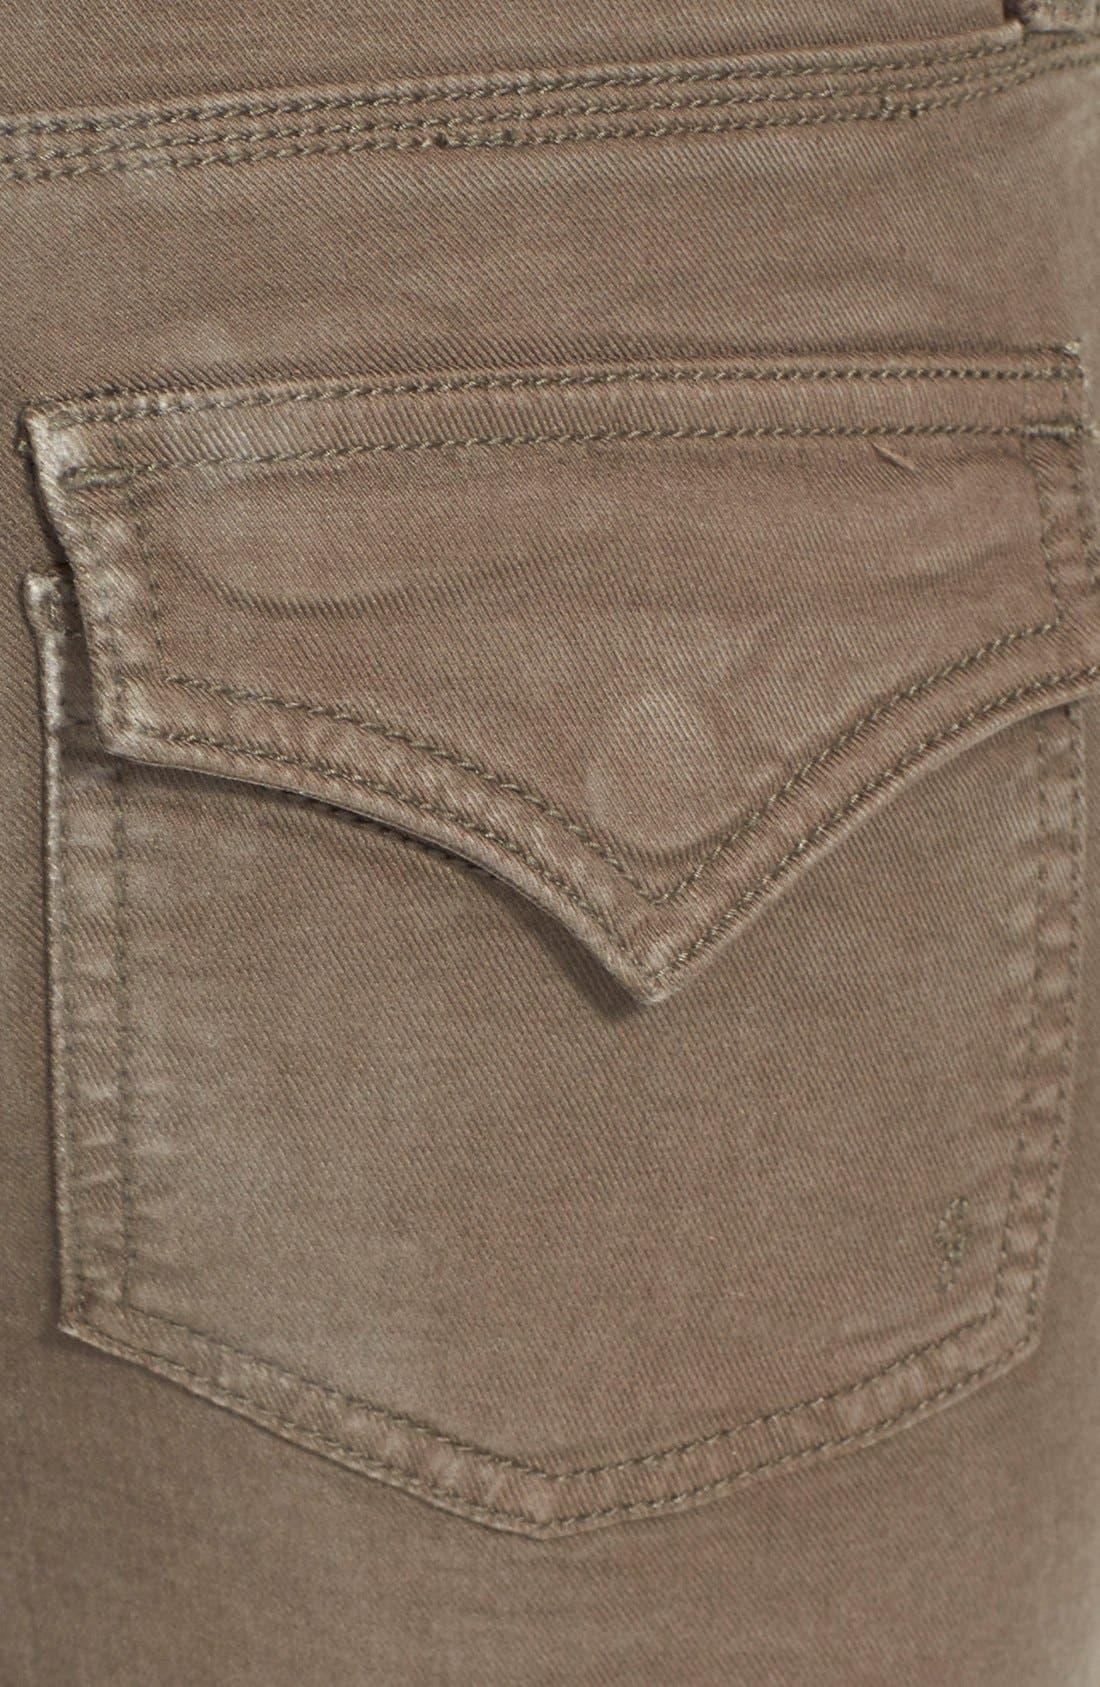 Park Skinny Pants,                             Alternate thumbnail 31, color,